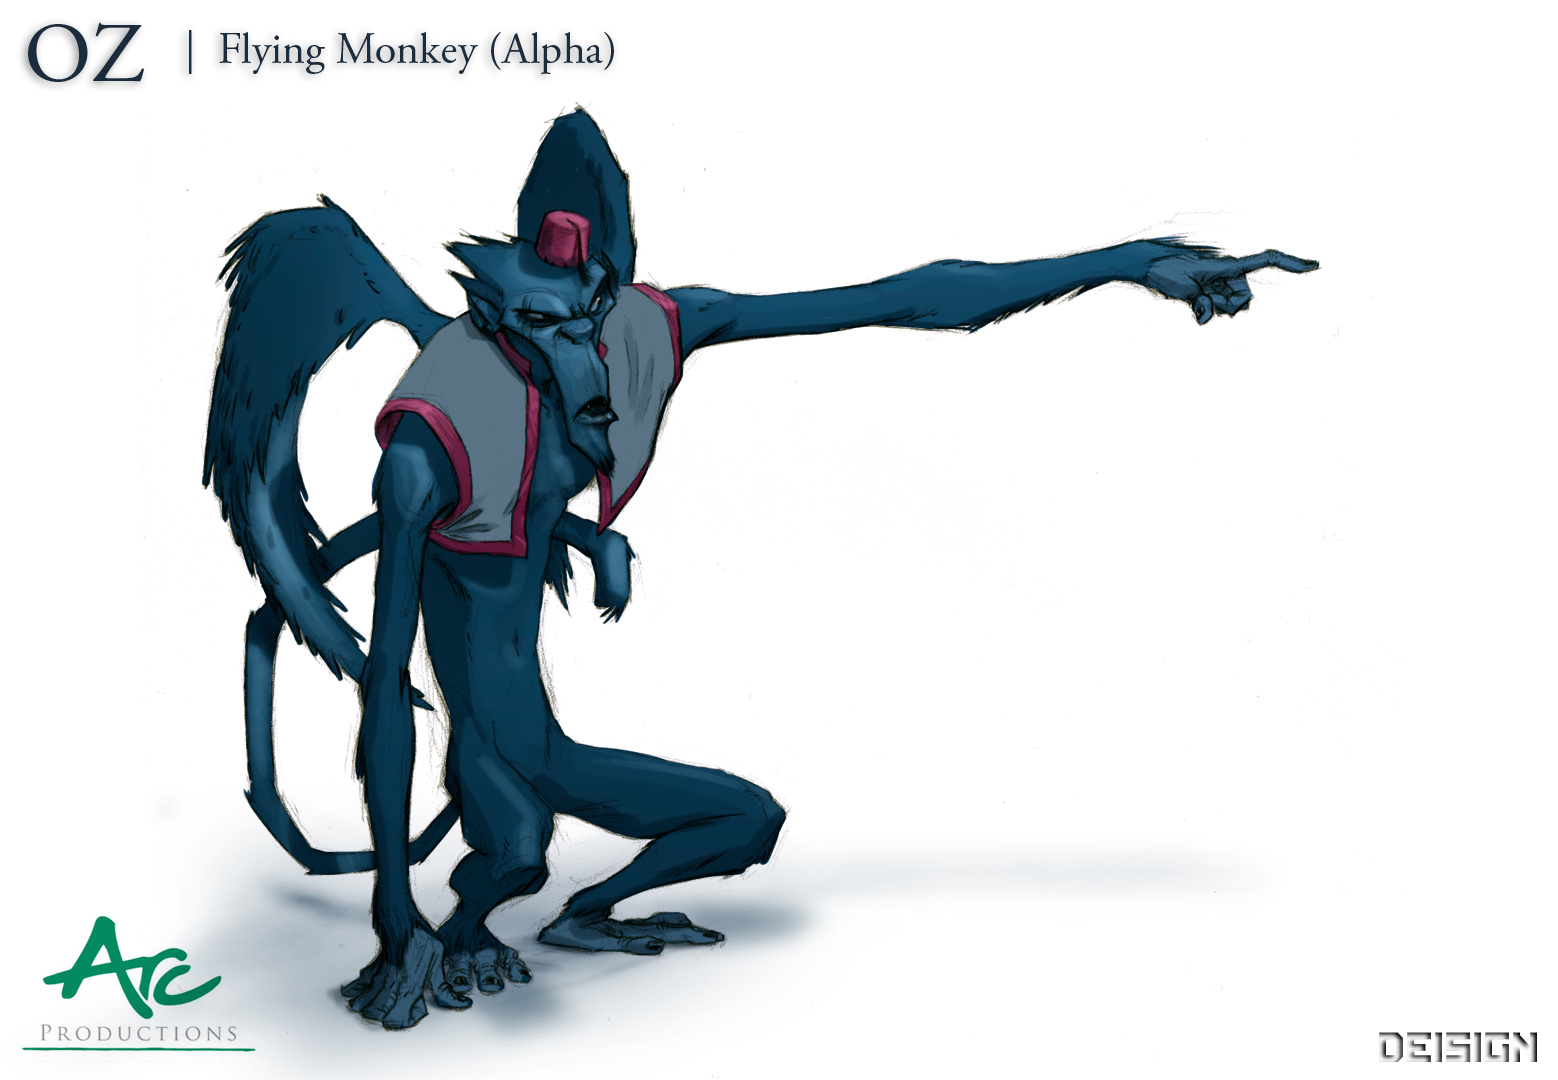 http://1.bp.blogspot.com/-0uKiAm-9Dxg/ULvqG-hkS5I/AAAAAAAACL8/9OTIk88U7Z0/s1600/DEISIGN_OZ_3D_Flying_Monkey_Arc_Productions.jpg